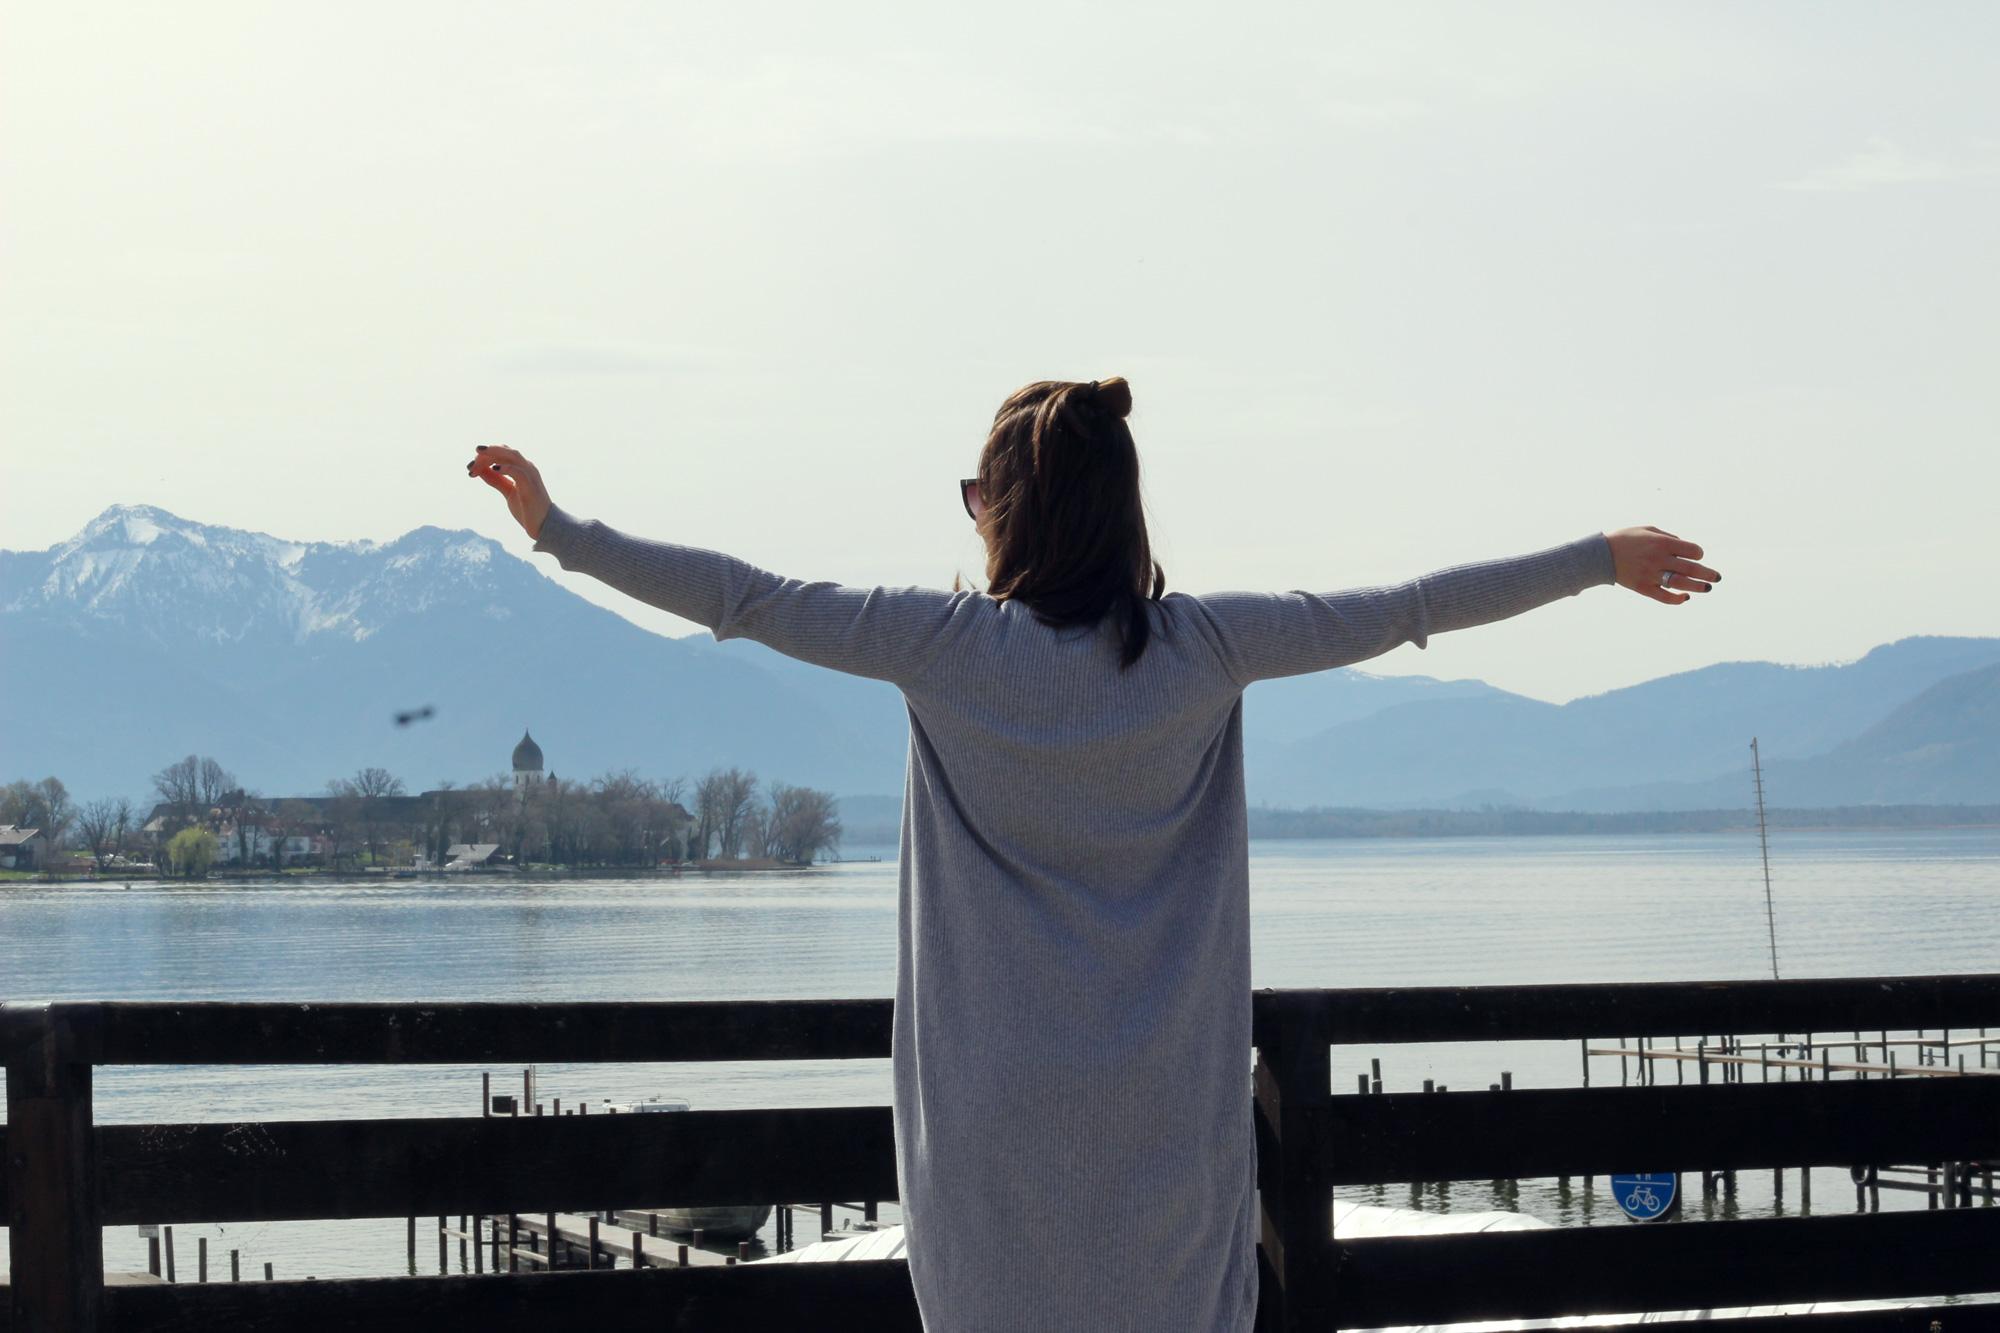 Cheimsee-lake-Bayern-weekend-escape-2